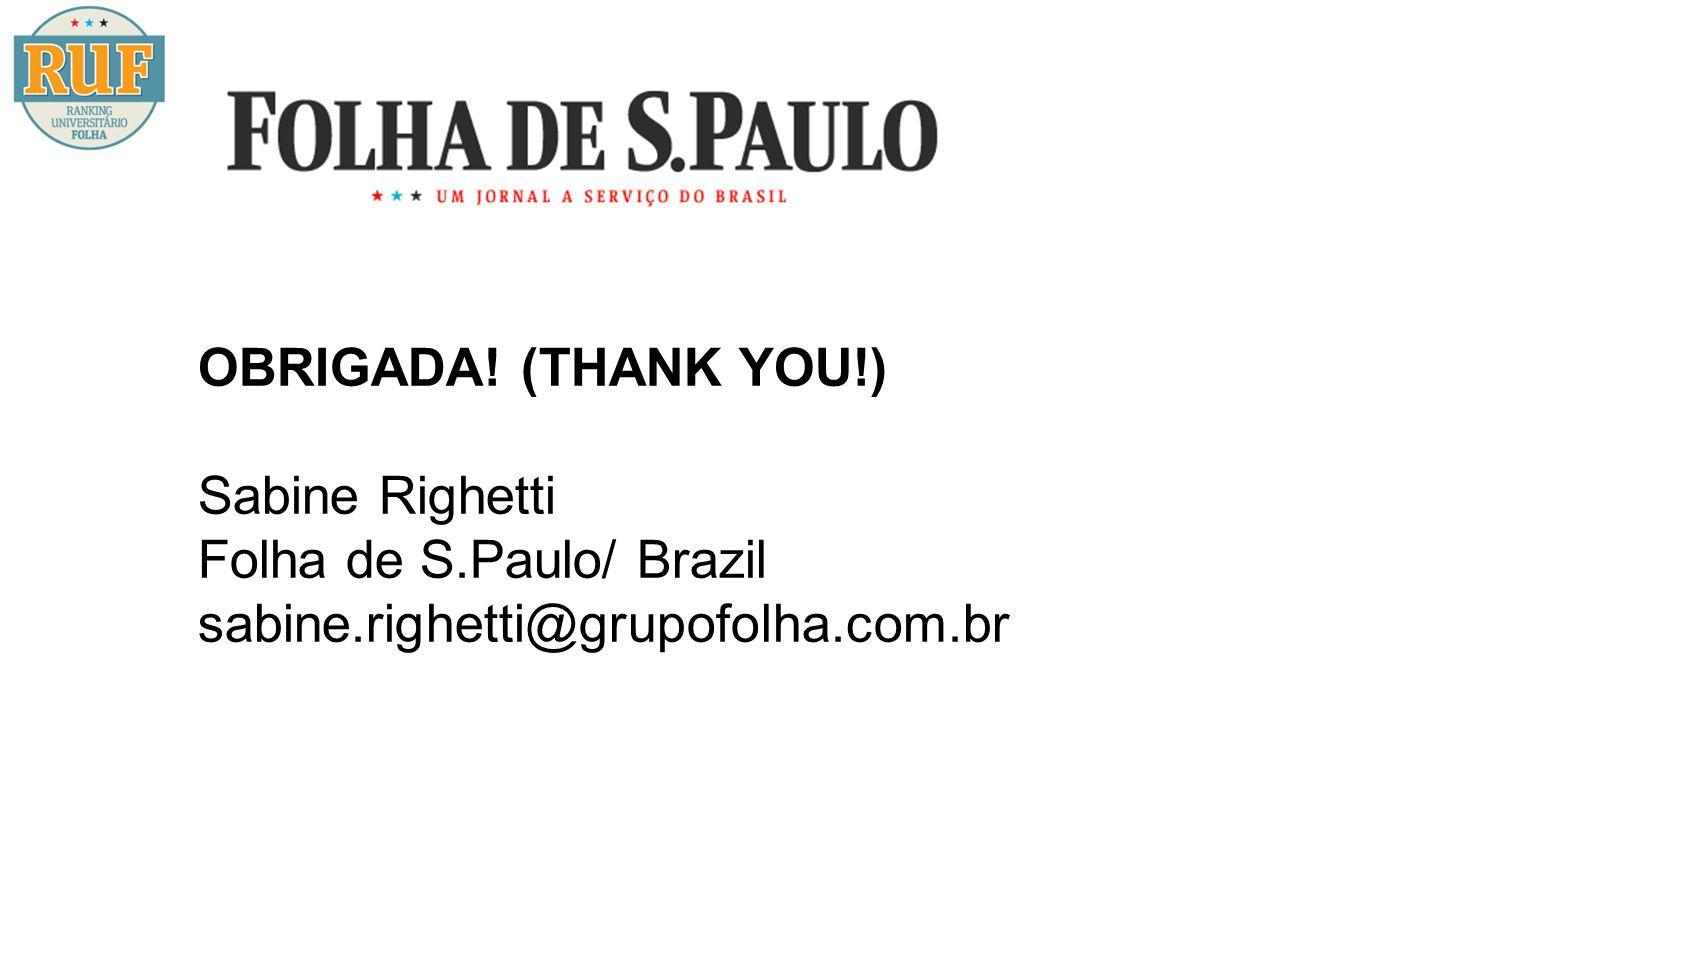 OBRIGADA! (THANK YOU!) Sabine Righetti Folha de S.Paulo/ Brazil sabine.righetti@grupofolha.com.br